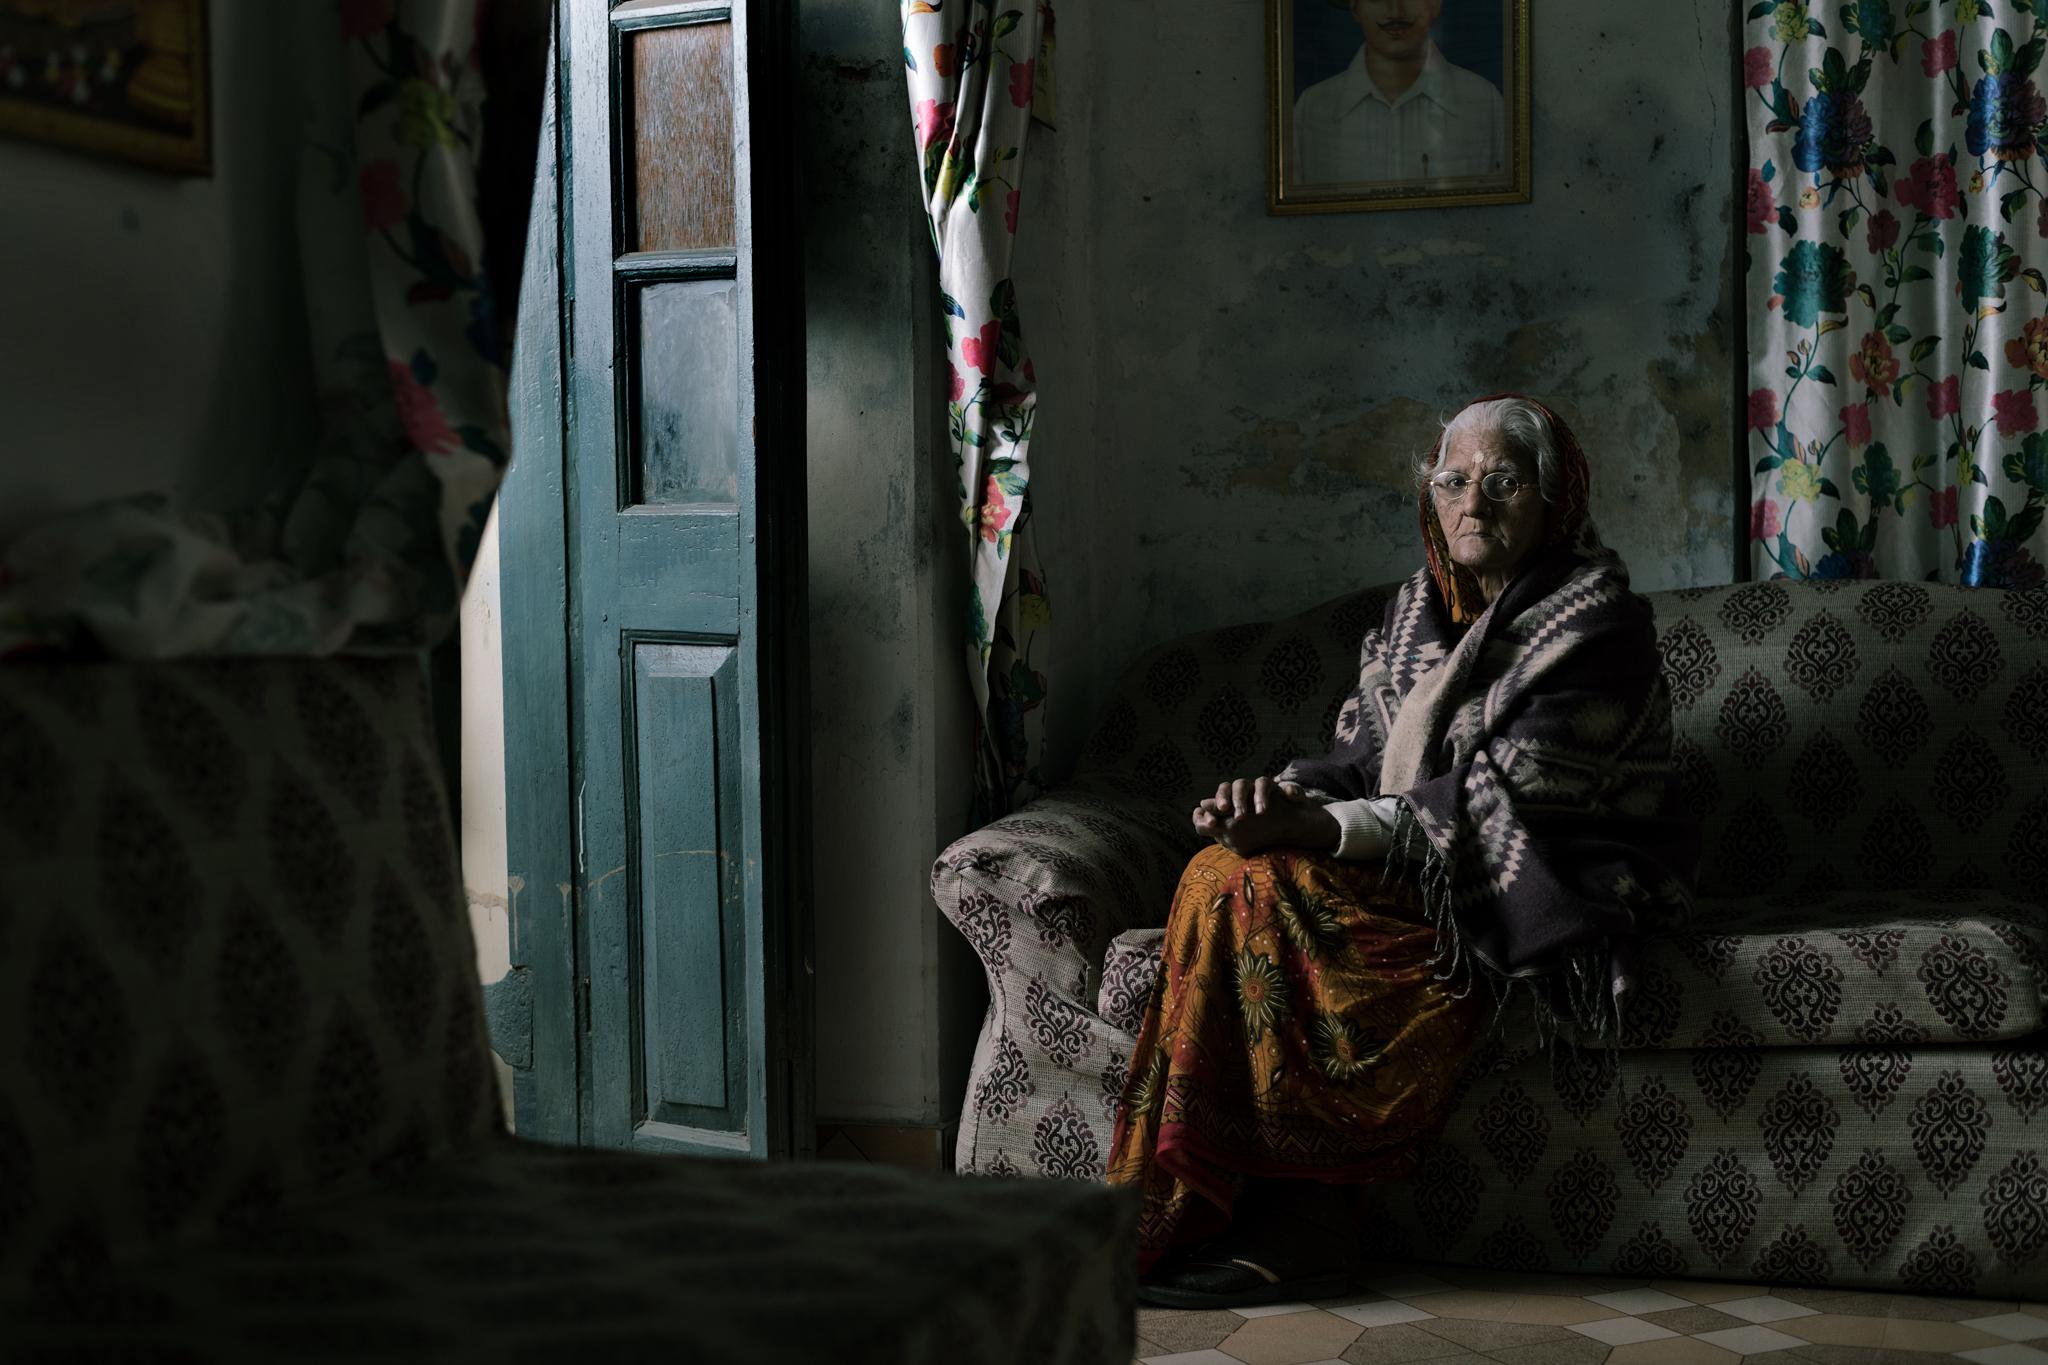 Varanasi_portrait_travel_photography_Manchester_Adventure_Photographer_Jan_Bella38.jpg